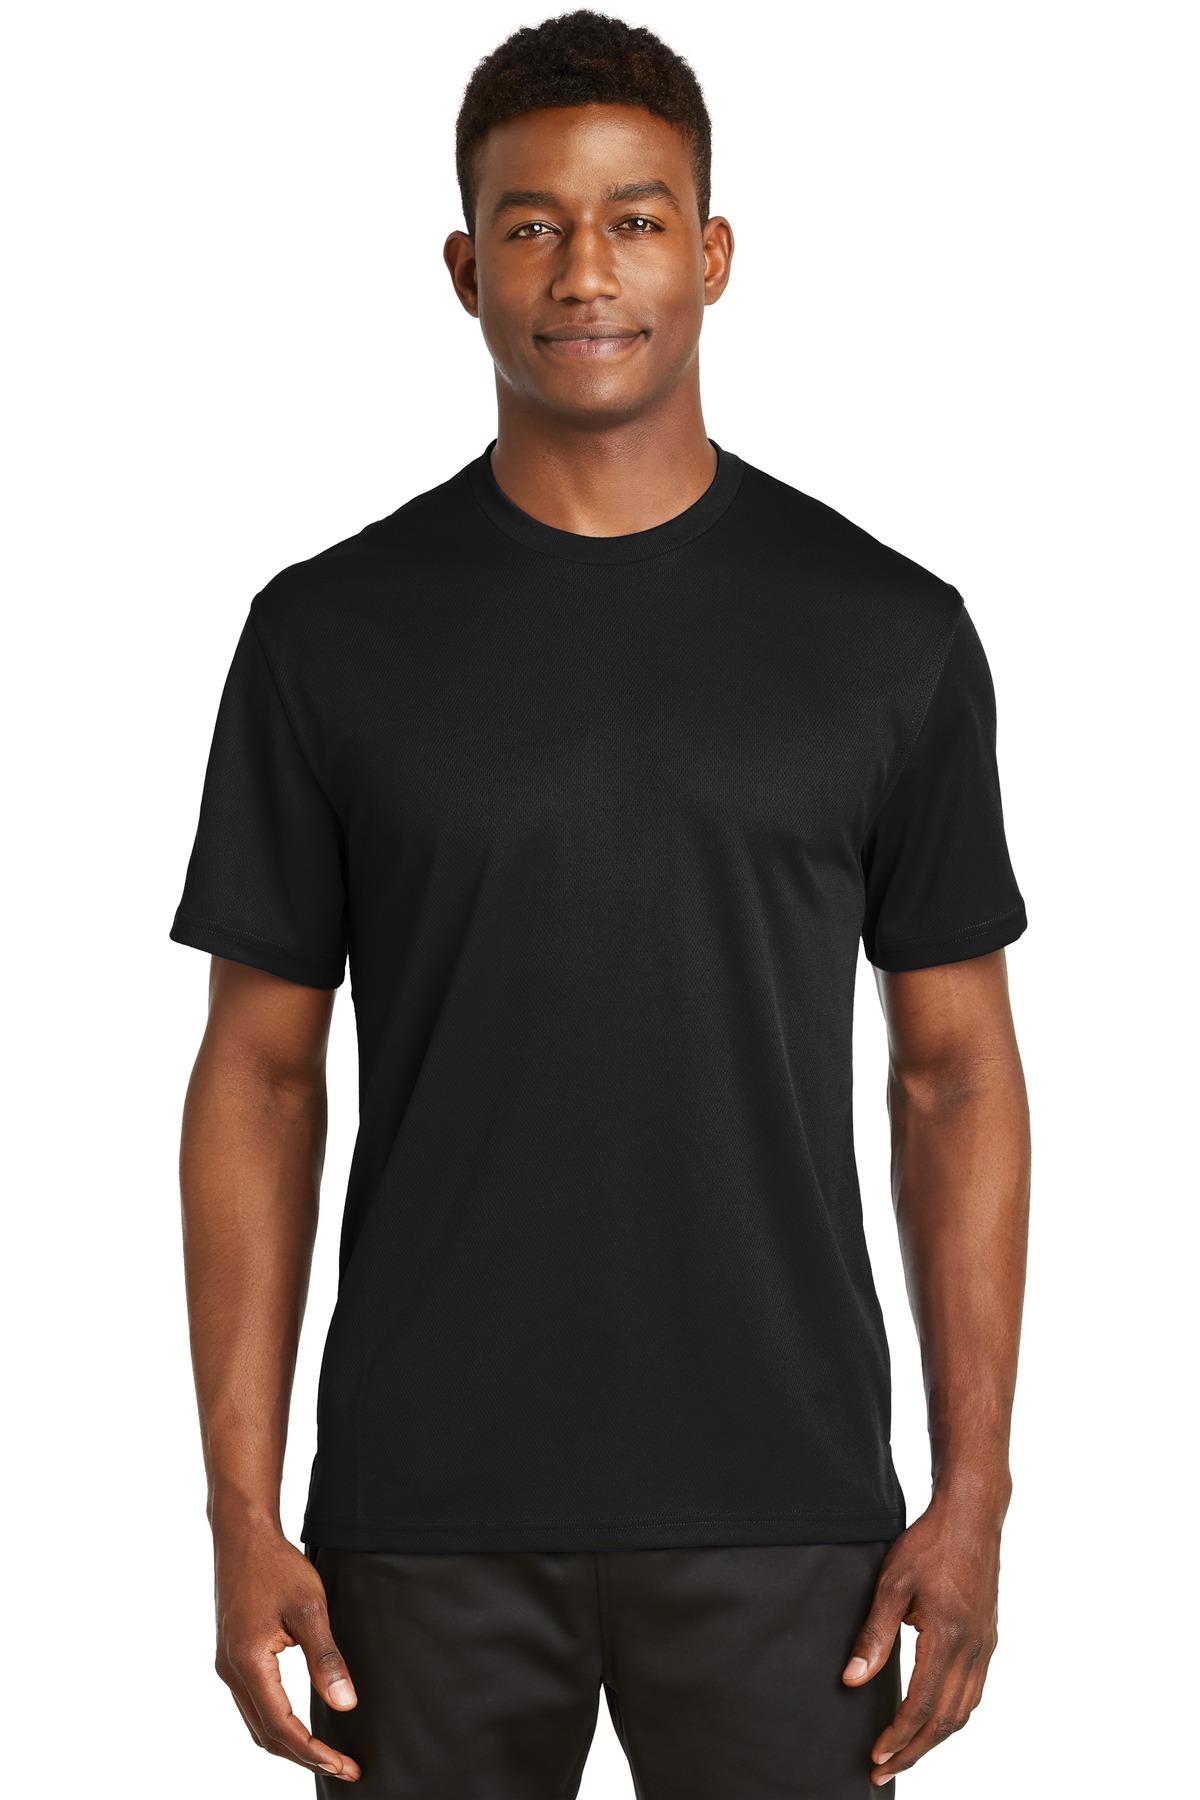 EL PASO POLICE Sport-Tek® Dri-Mesh® Short Sleeve T-Shirt.-Sport-Tek